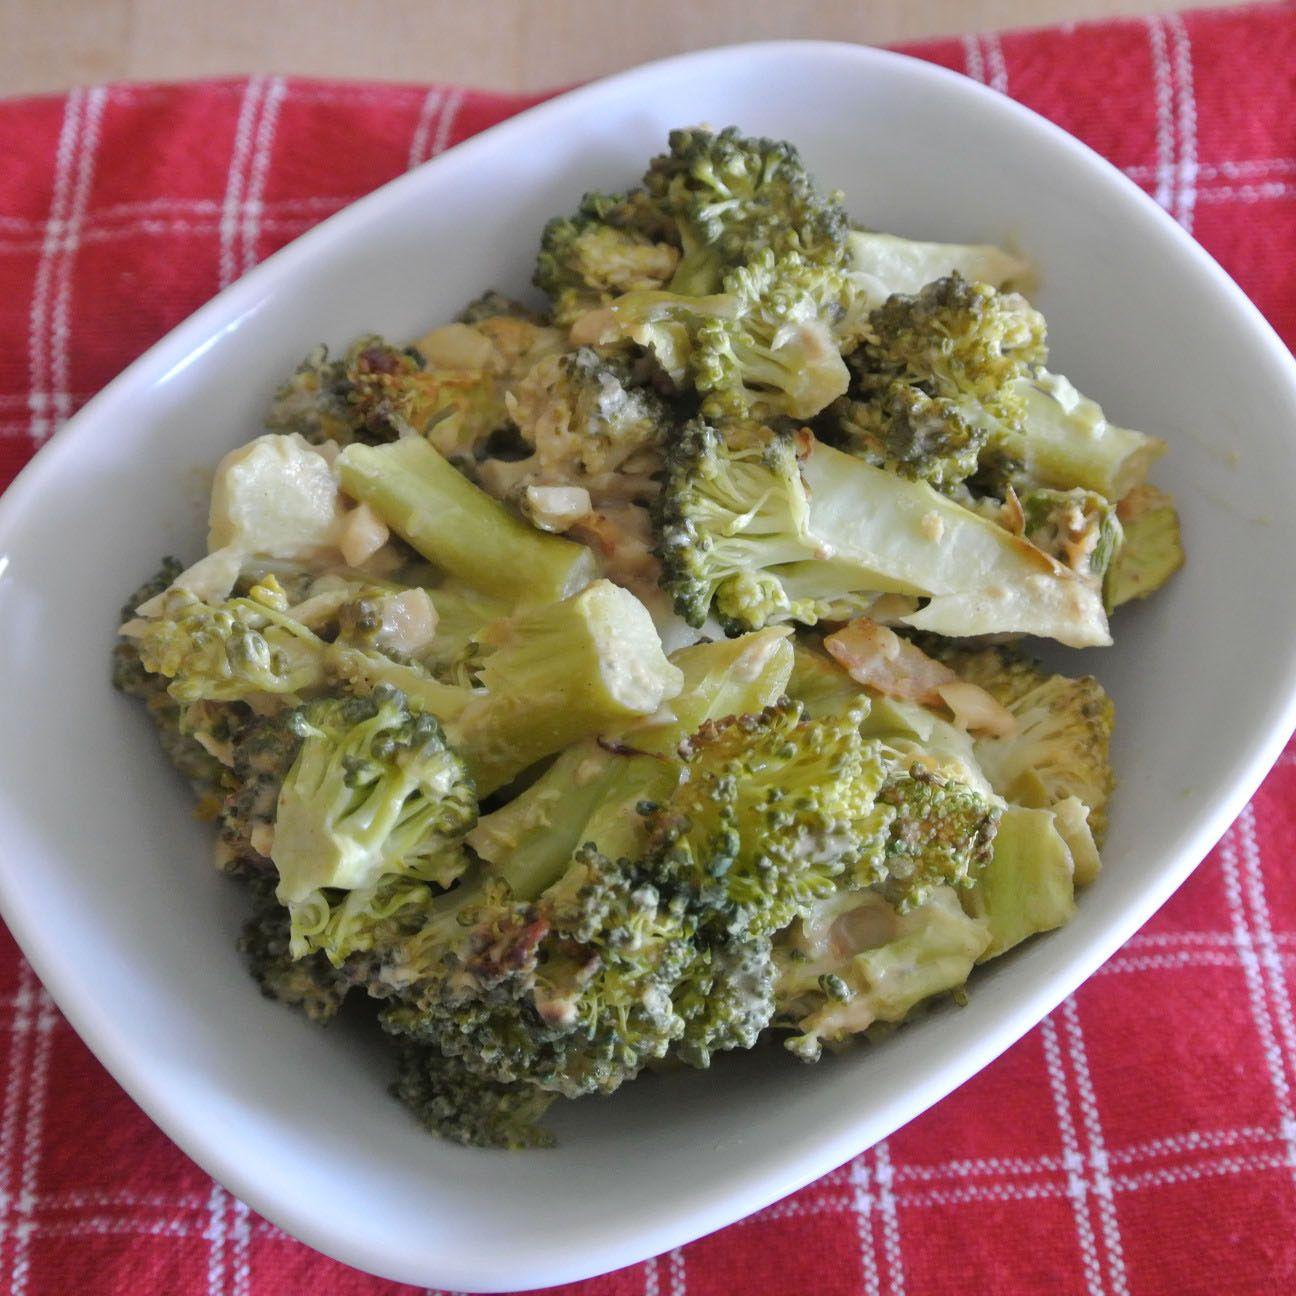 zero calorie life zero calorie dijon garlic broccoli optifast vlcd intensive recipes. Black Bedroom Furniture Sets. Home Design Ideas